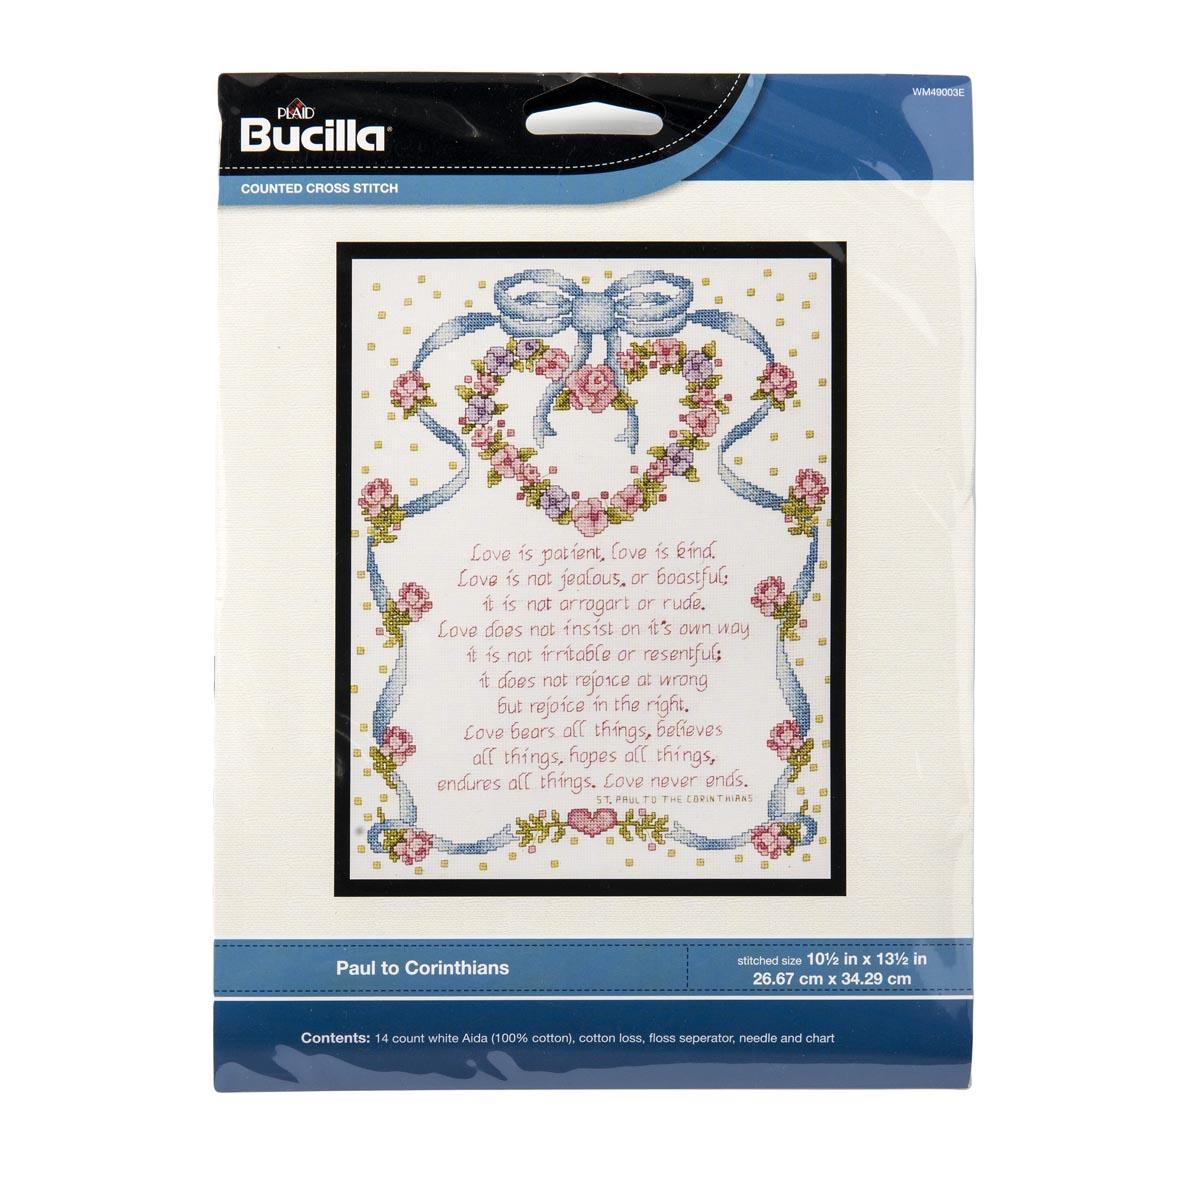 Bucilla ® Counted Cross Stitch - Picture Kits - Paul to Corinthians - WM49003E